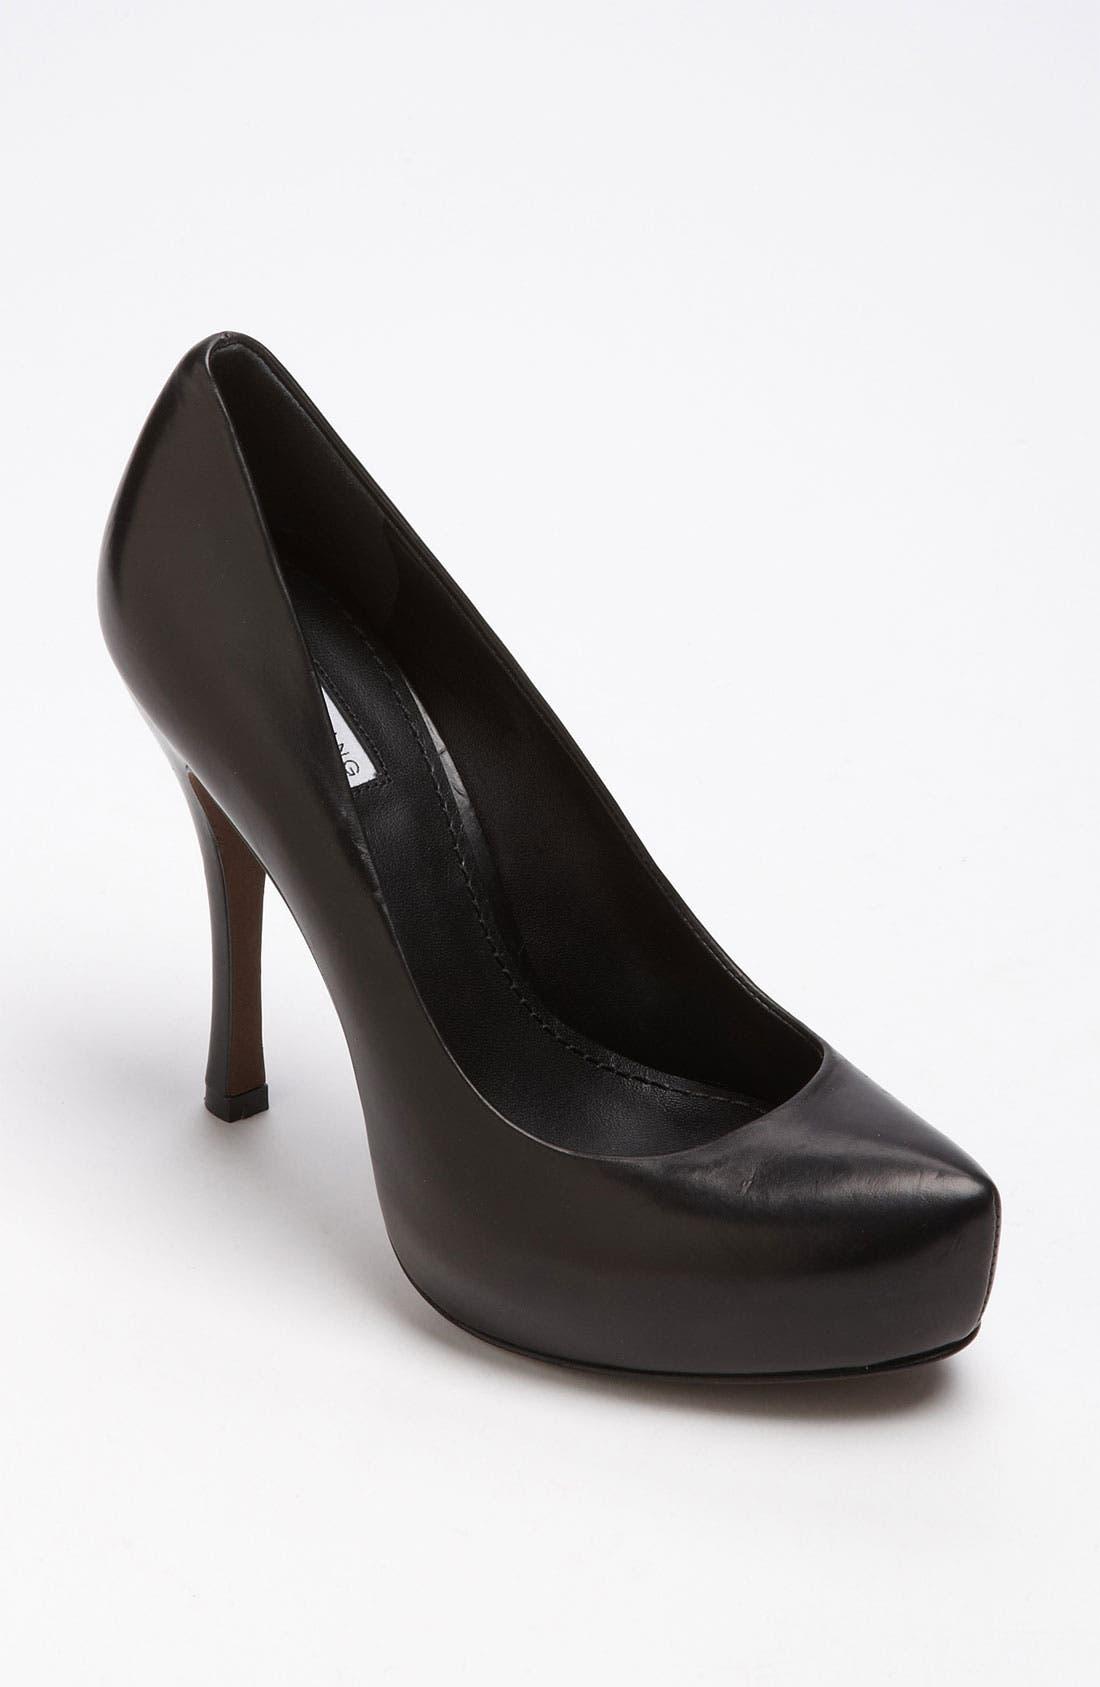 Alternate Image 1 Selected - Vera Wang Footwear 'Raquel' Pump